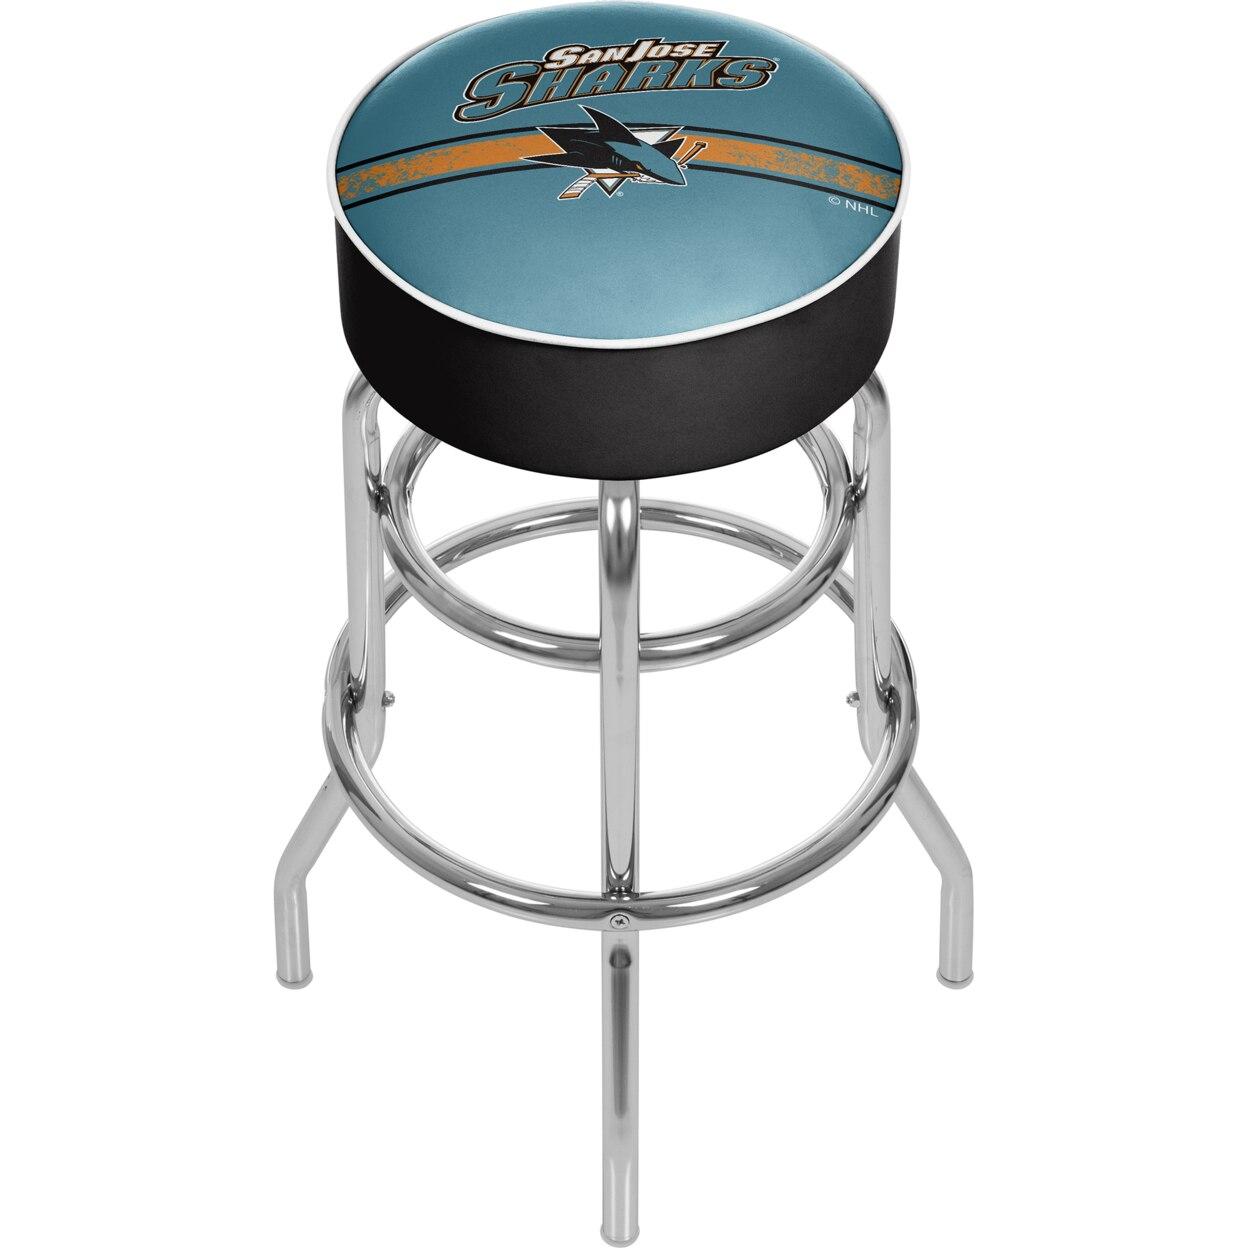 NHL Chrome Padded Swivel Bar Stool 30 Inches High - San Jose Sharks толстовка wearcraft premium унисекс printio san jose sharks nhl usa